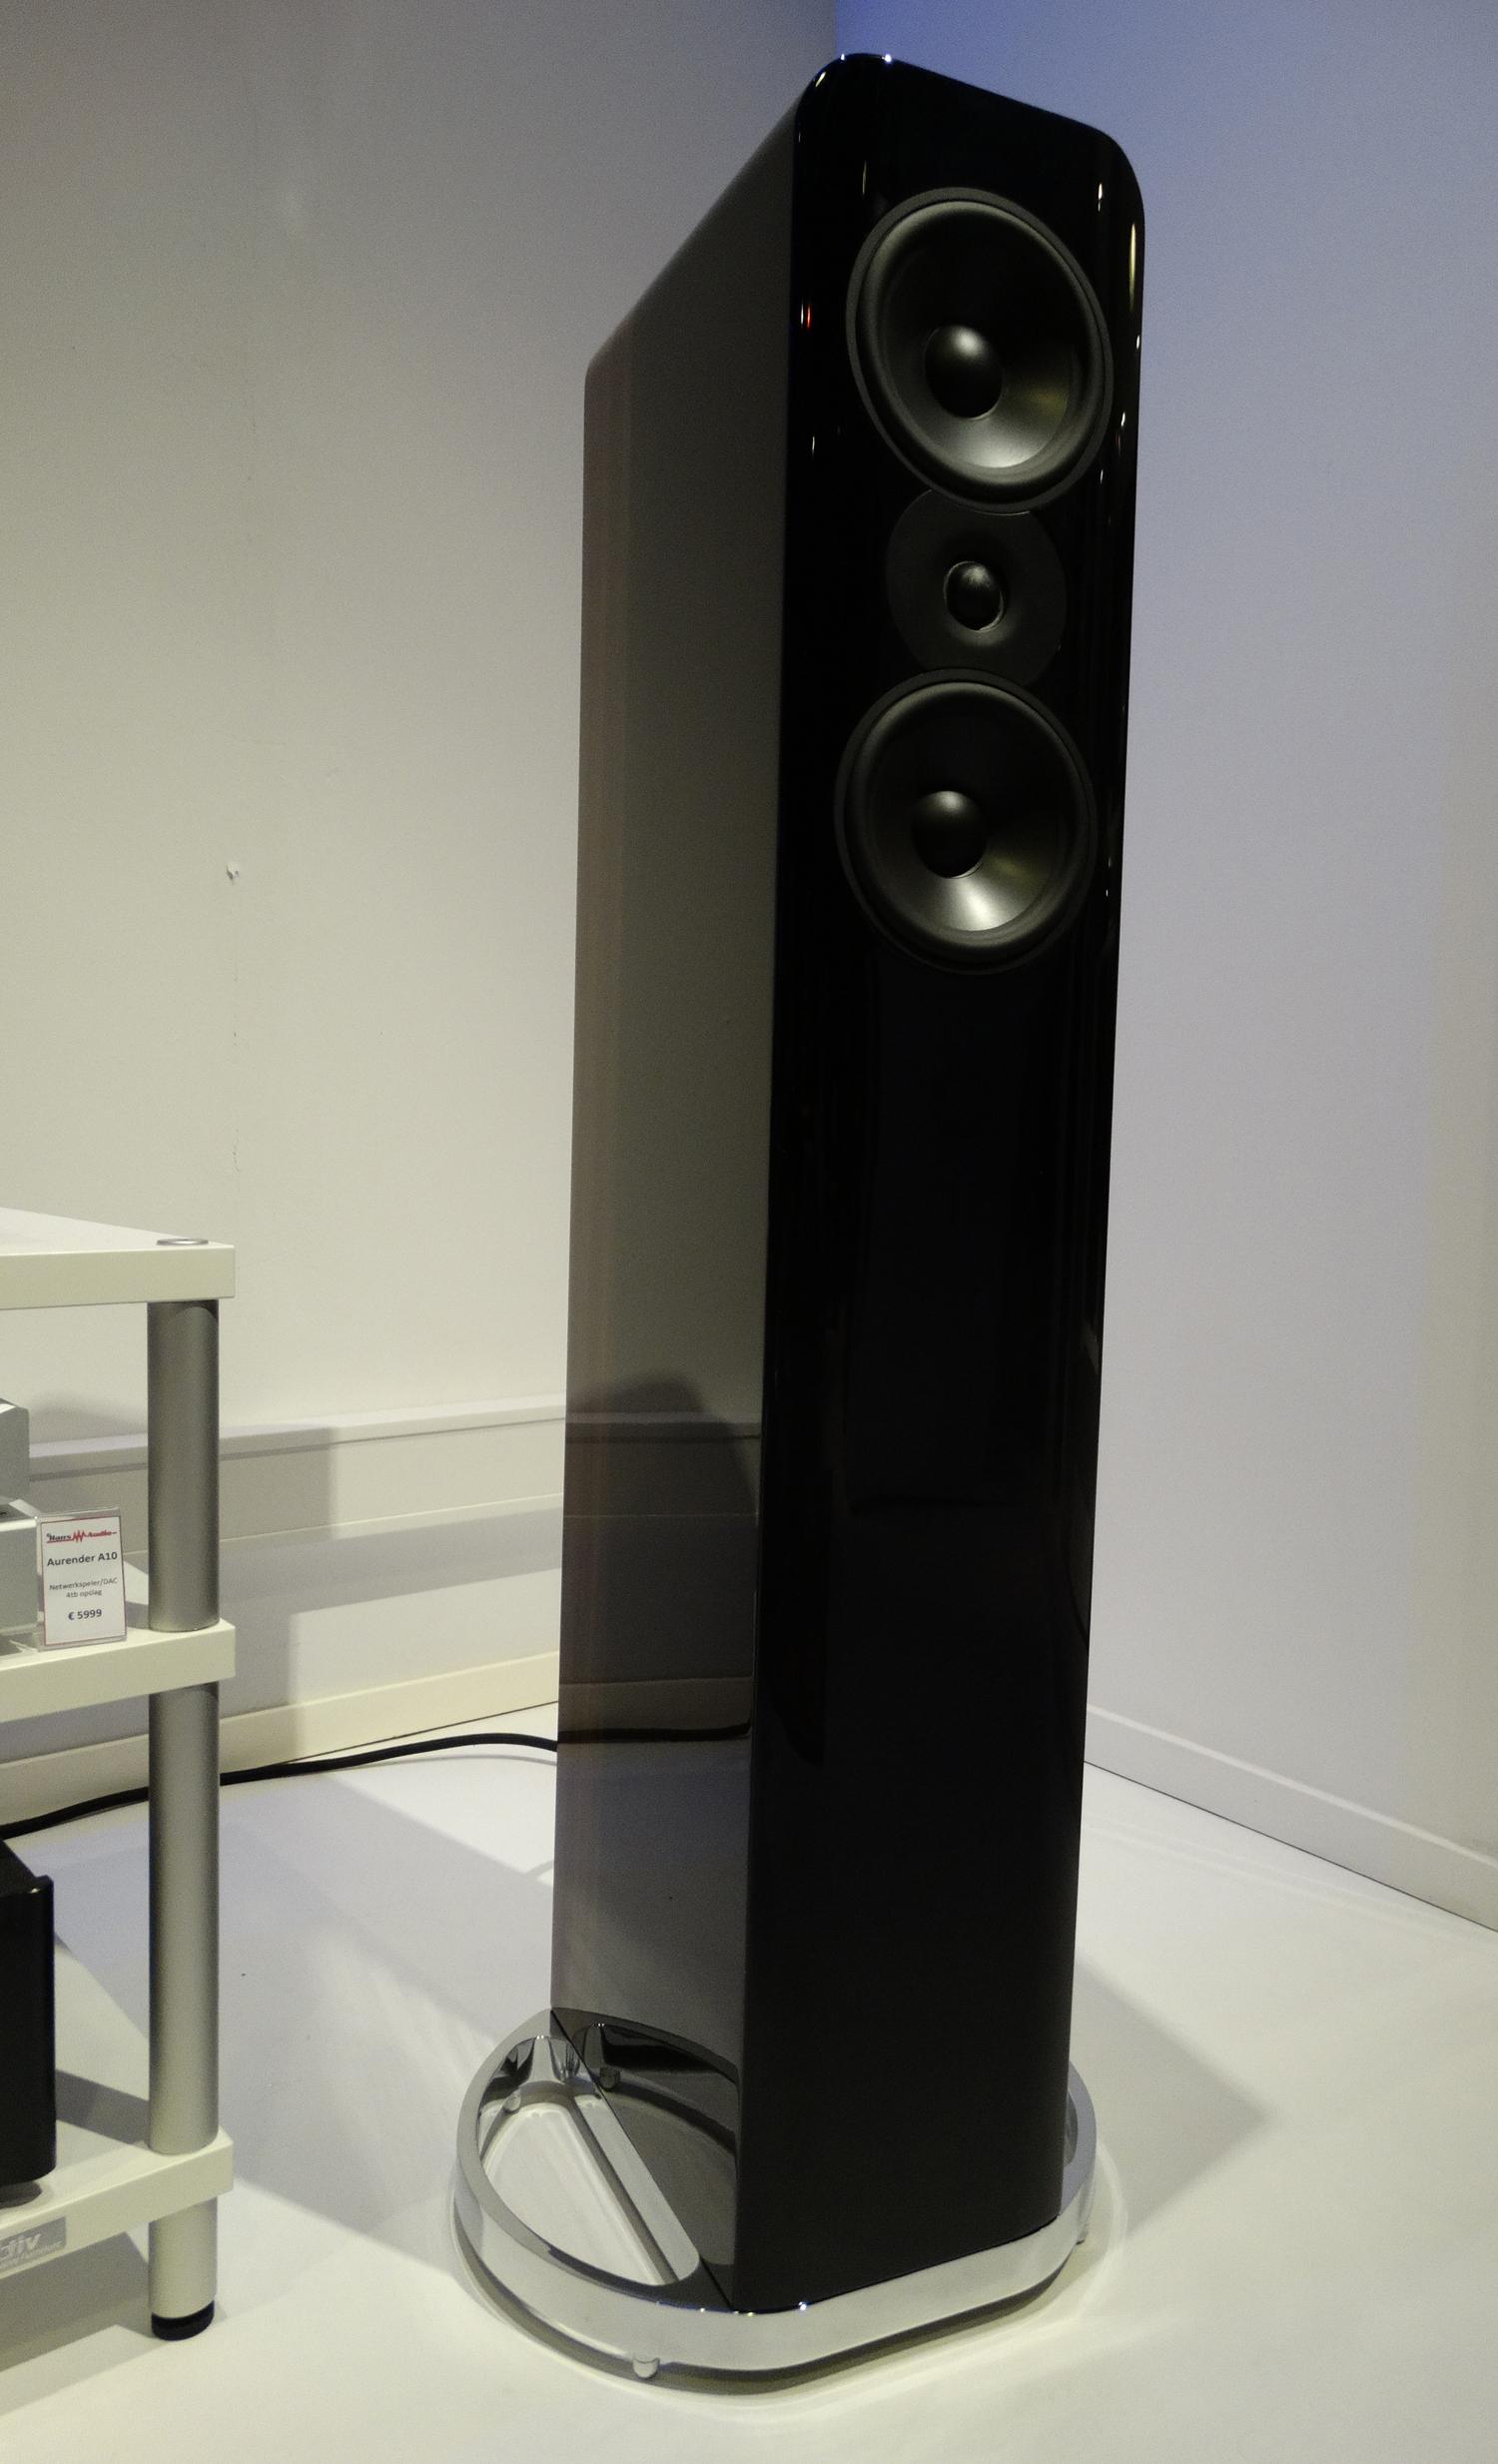 Q Acoustics Concept 500 Hans Audio 4 Primeur: Eerste dealer in Nederland met de Q Acoustics Concept 500